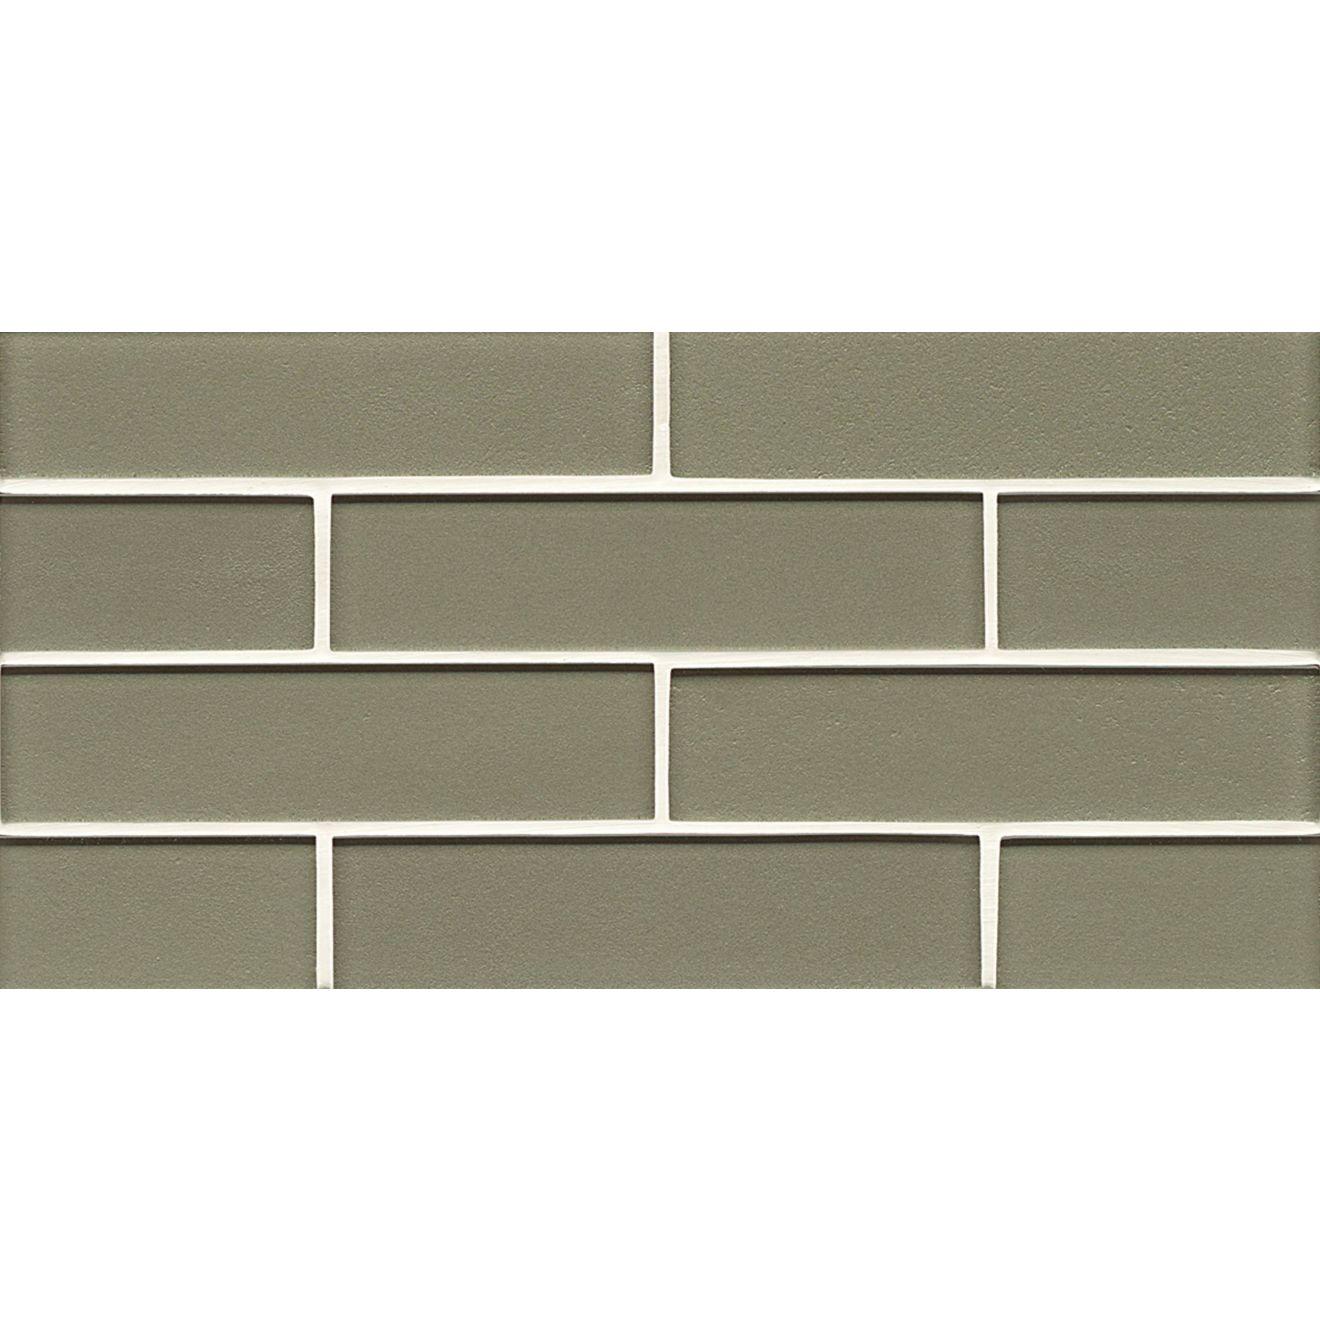 "Manhattan 2"" x 8"" Wall Mosaic in Mint"